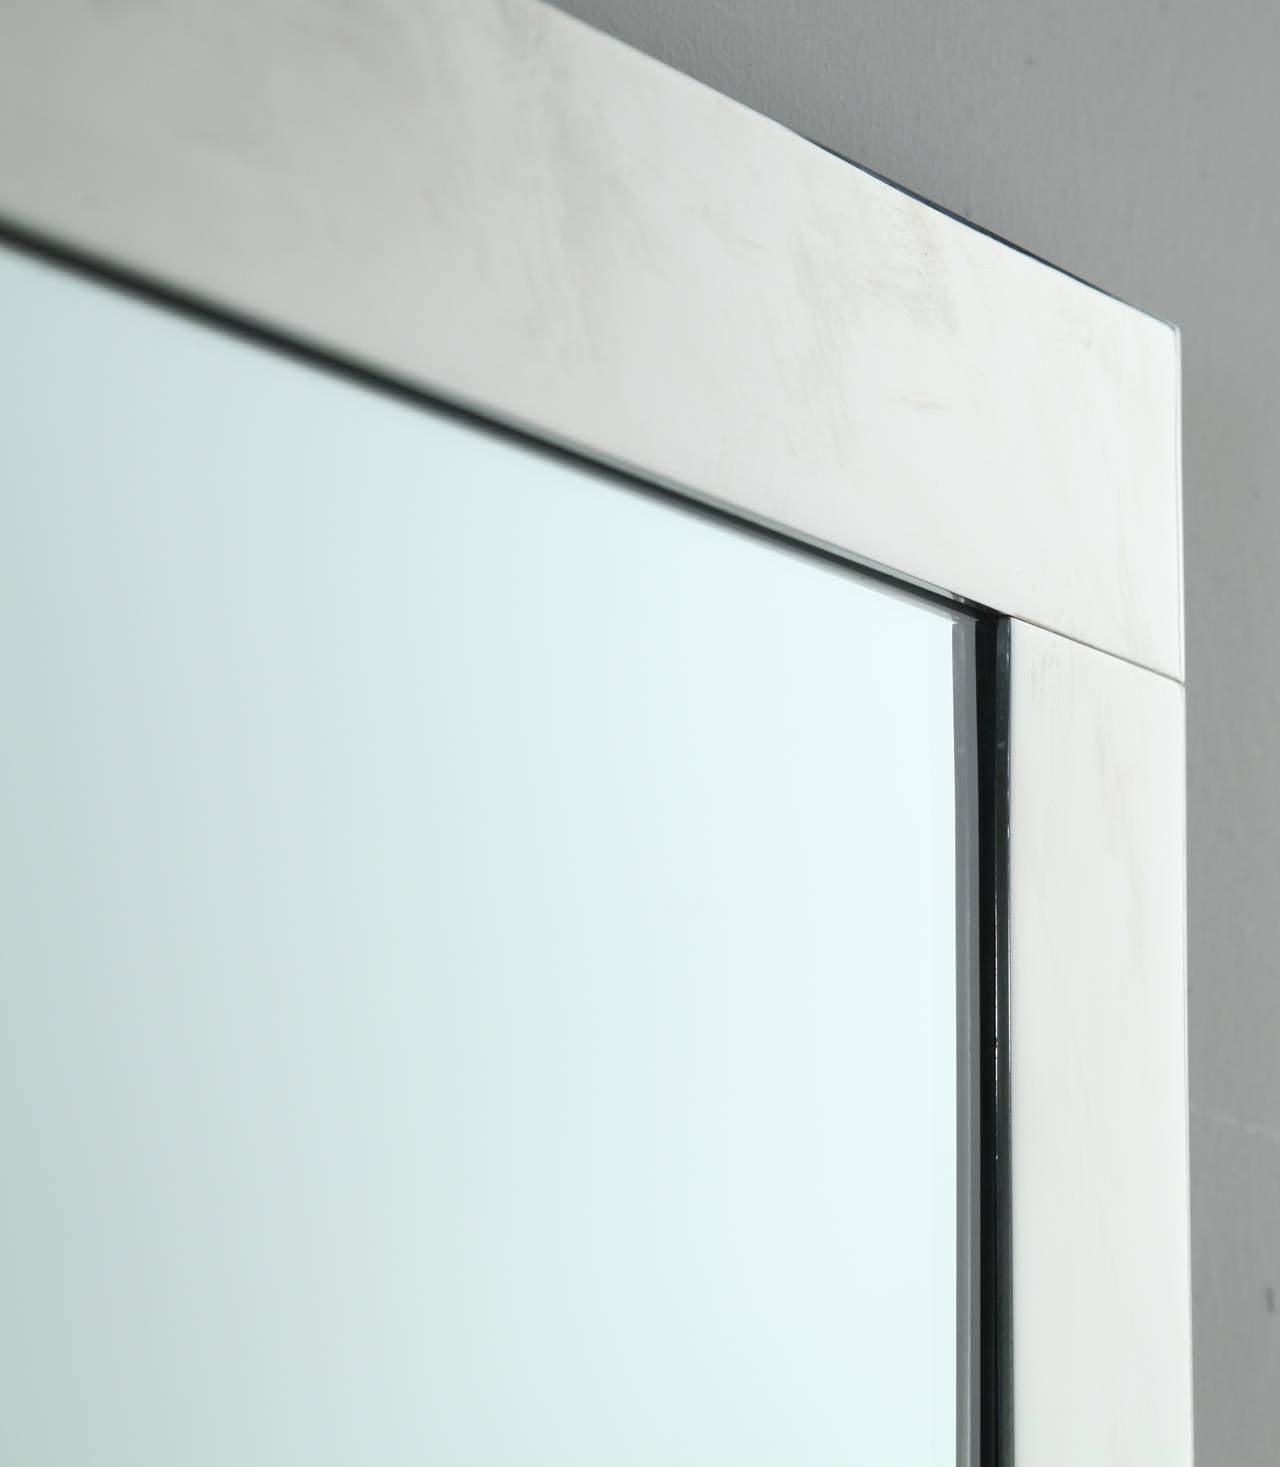 Large minimalist dominioni wall mirror for azucena italy for Minimalist art 1960